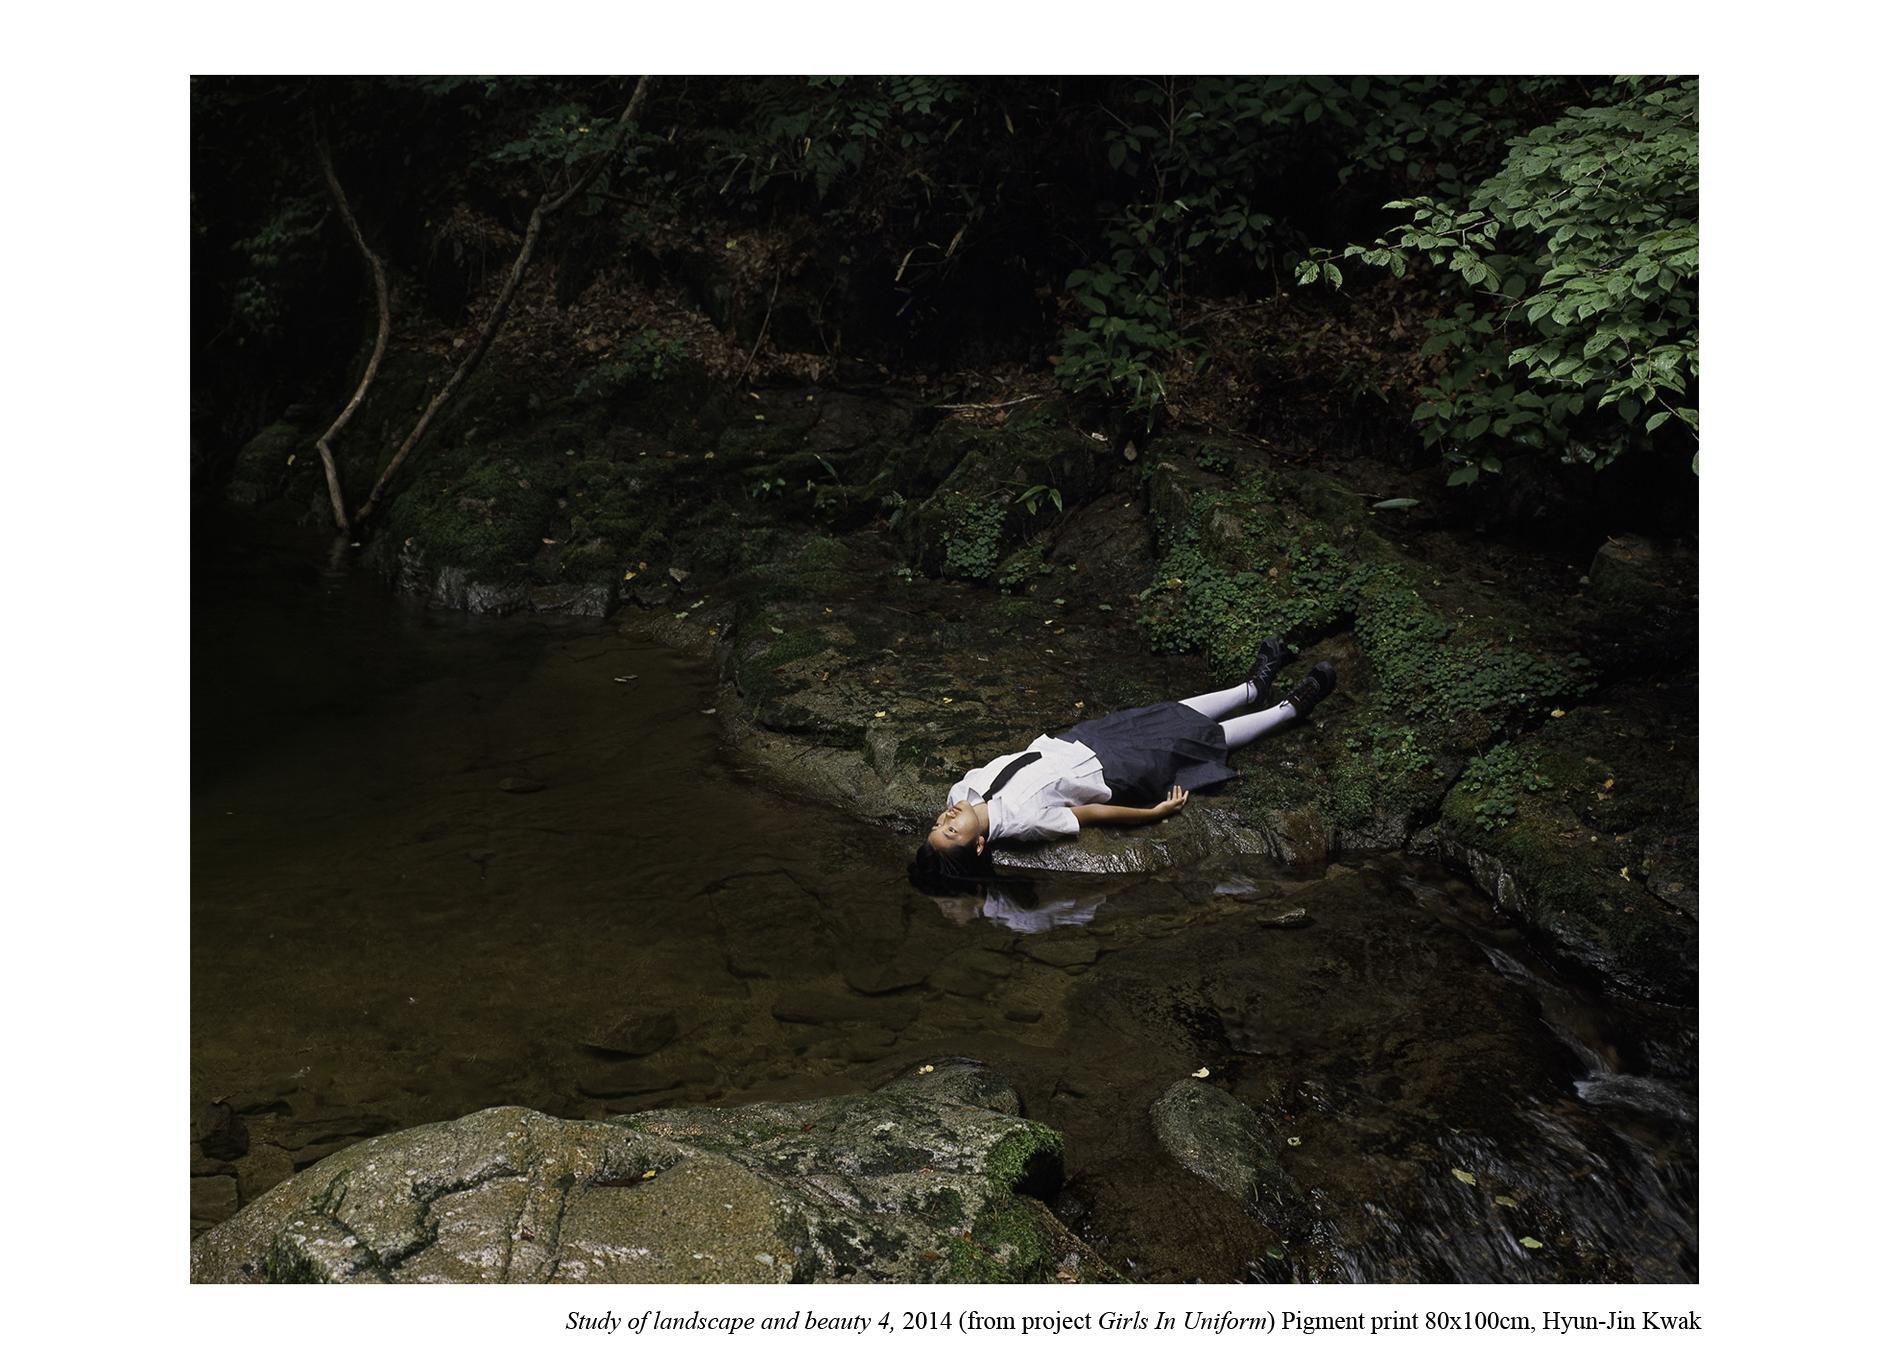 Hyun-Jin Kwak,  Study of Landscape and Beauty 4, 2014,80(H)x100(W)cm inkjet print